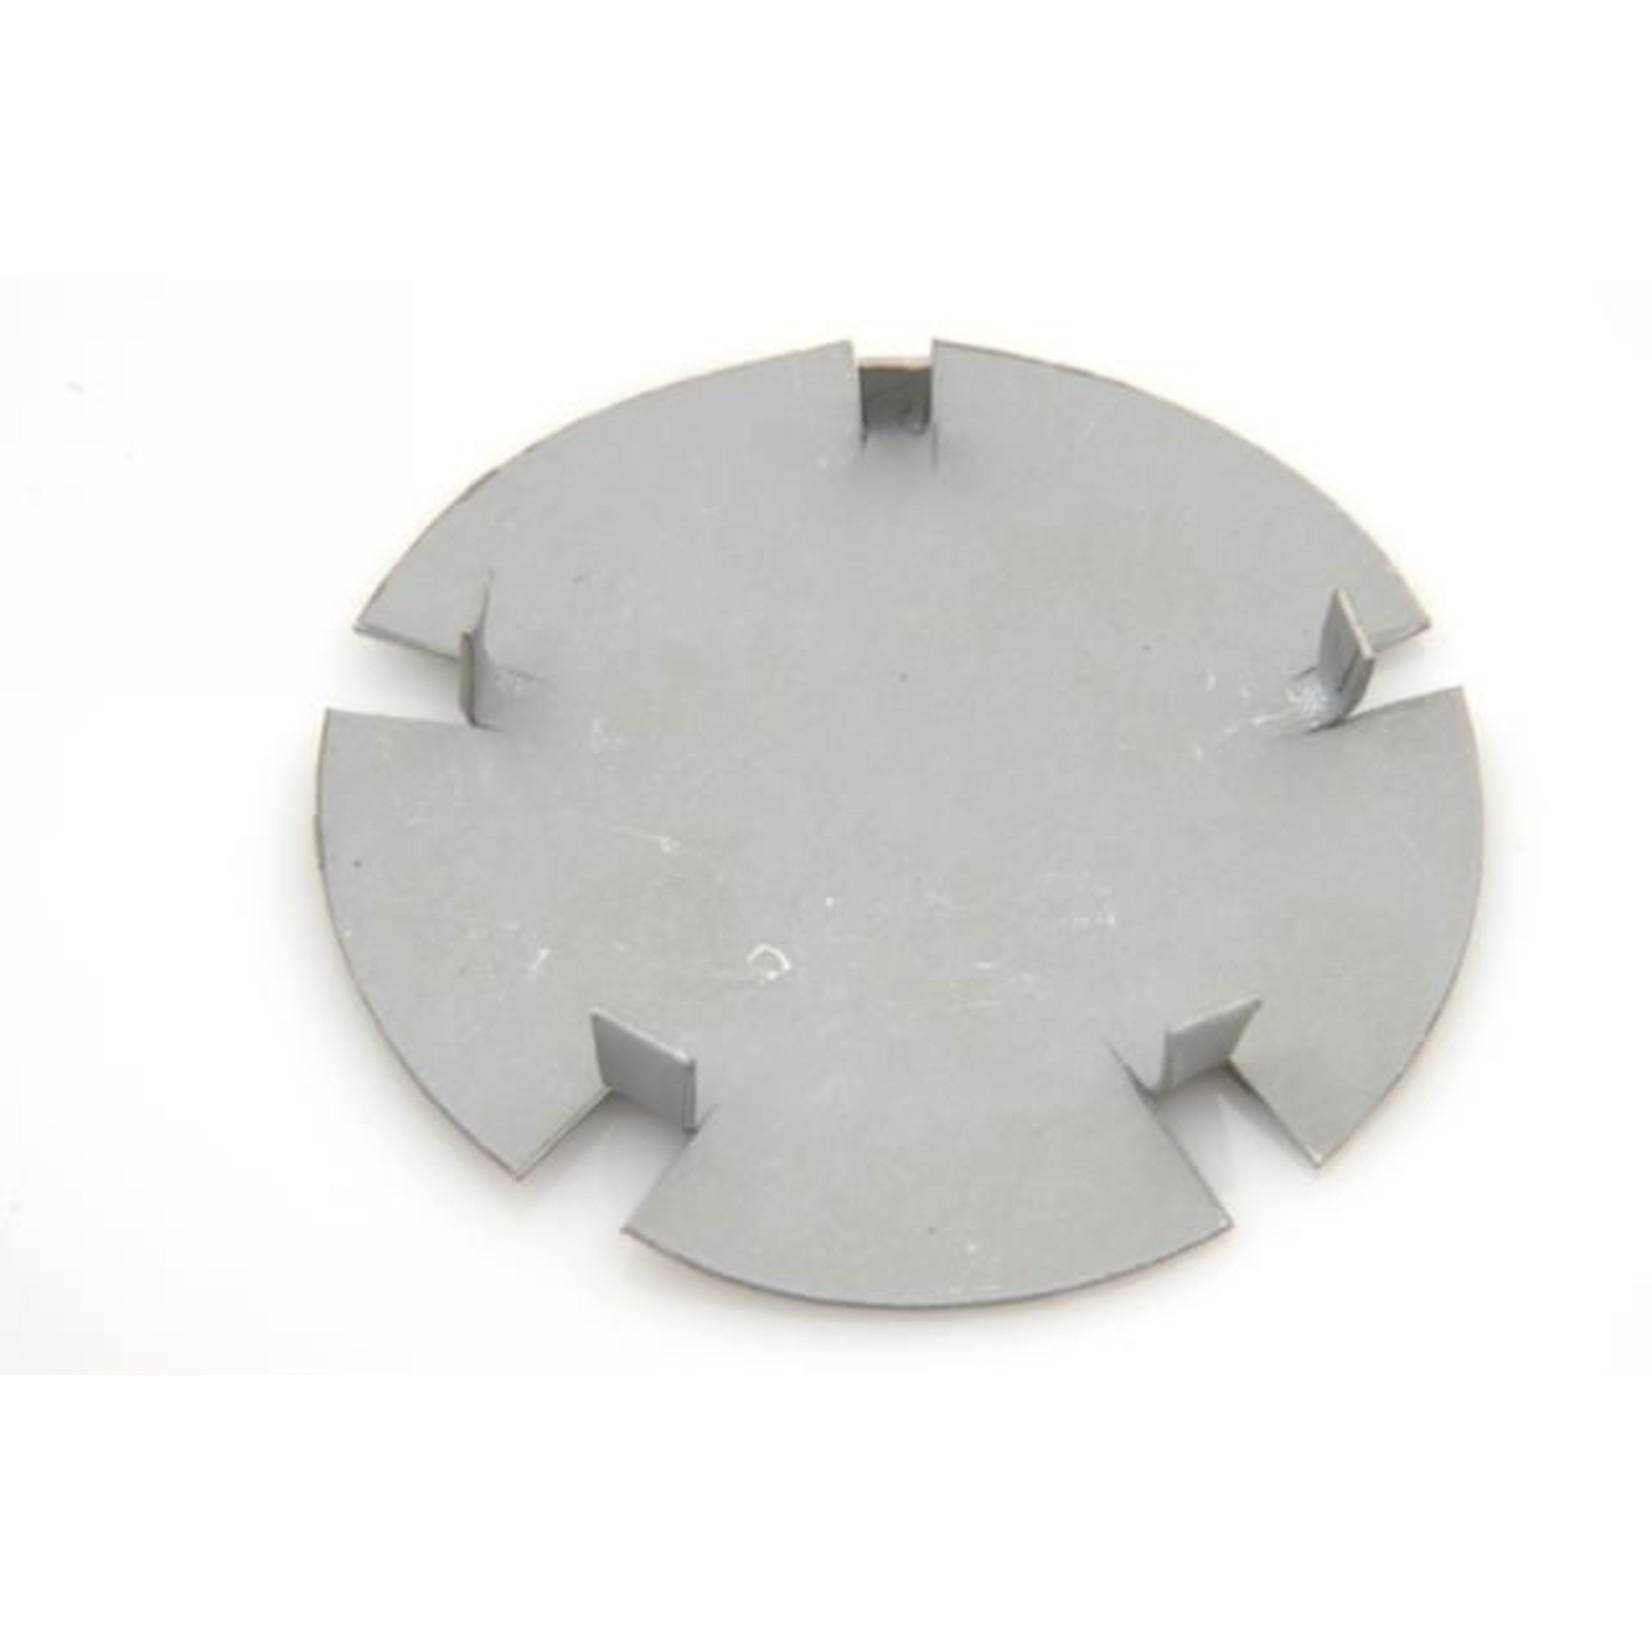 Pointed metal plug fixation Nr Org: DX744126